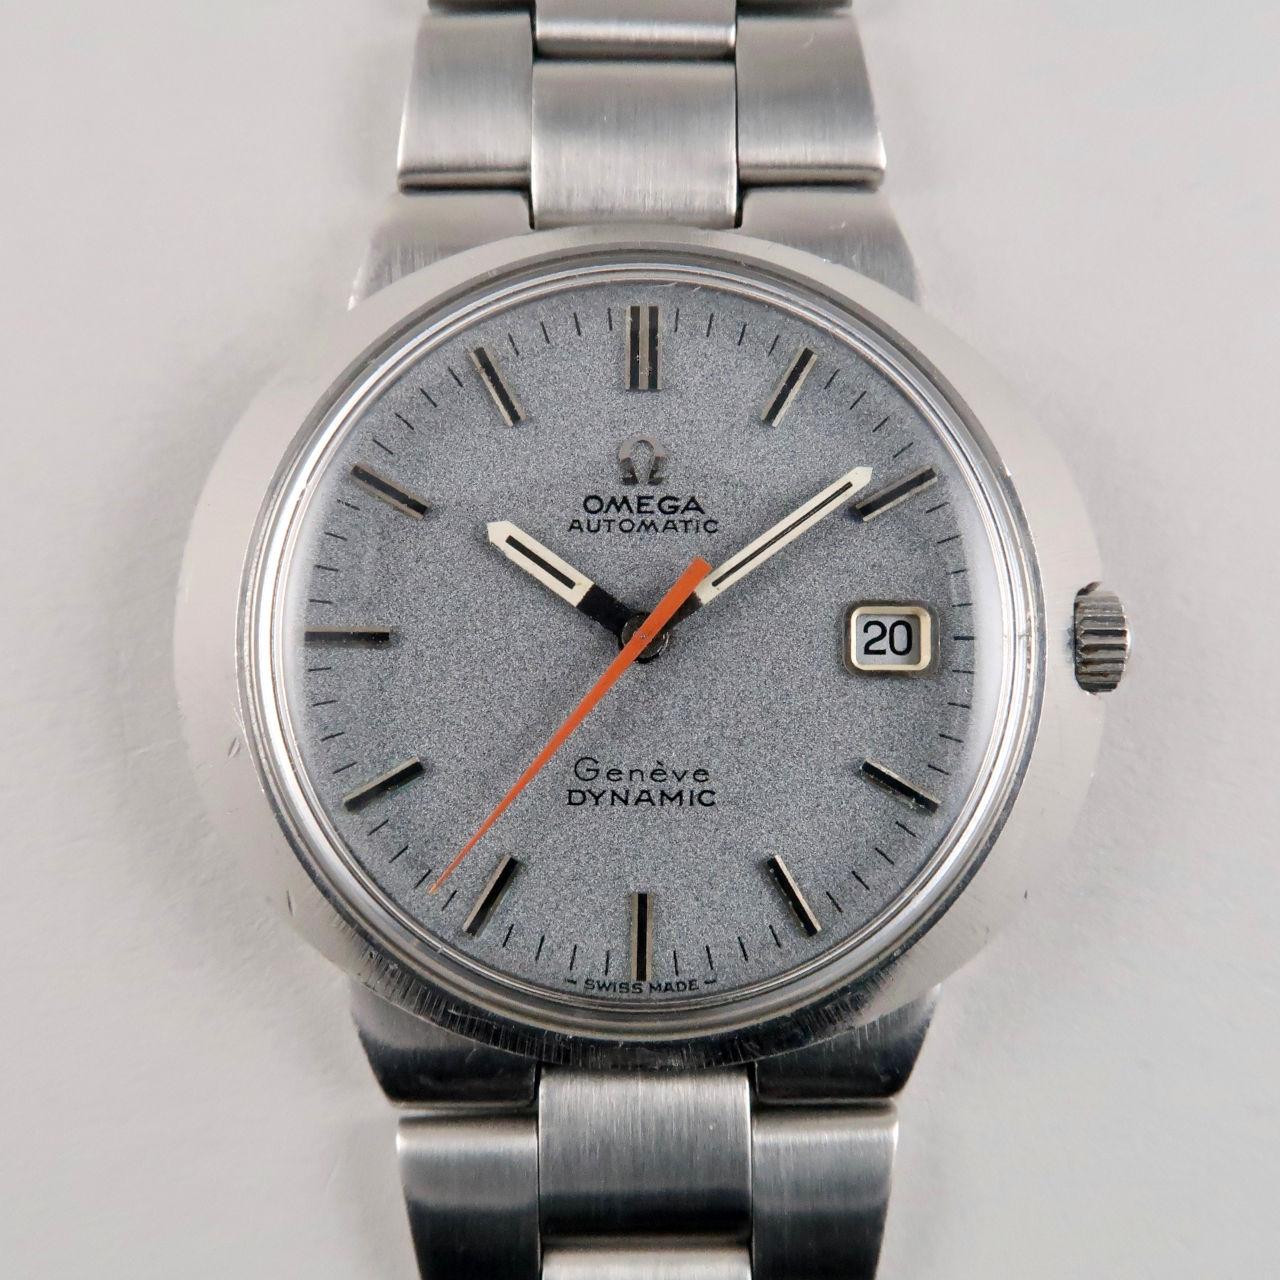 Omega Genève Dynamic Ref. 166.039 steel vintage wristwatch, circa 1969